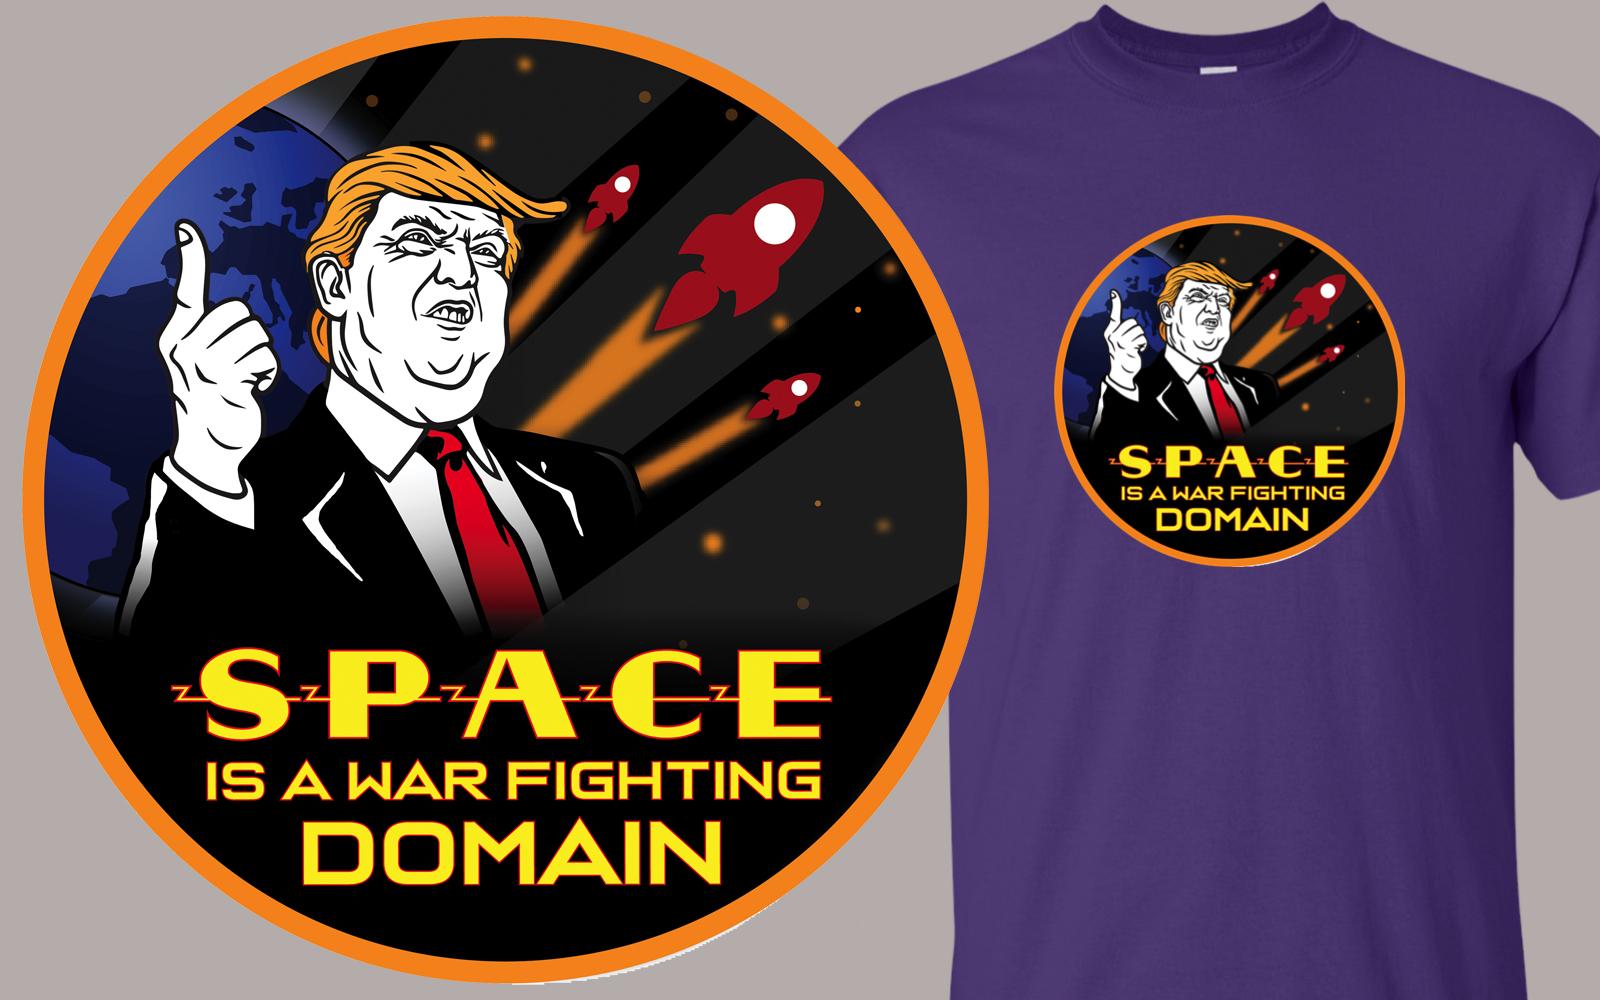 War Fighting Domain!